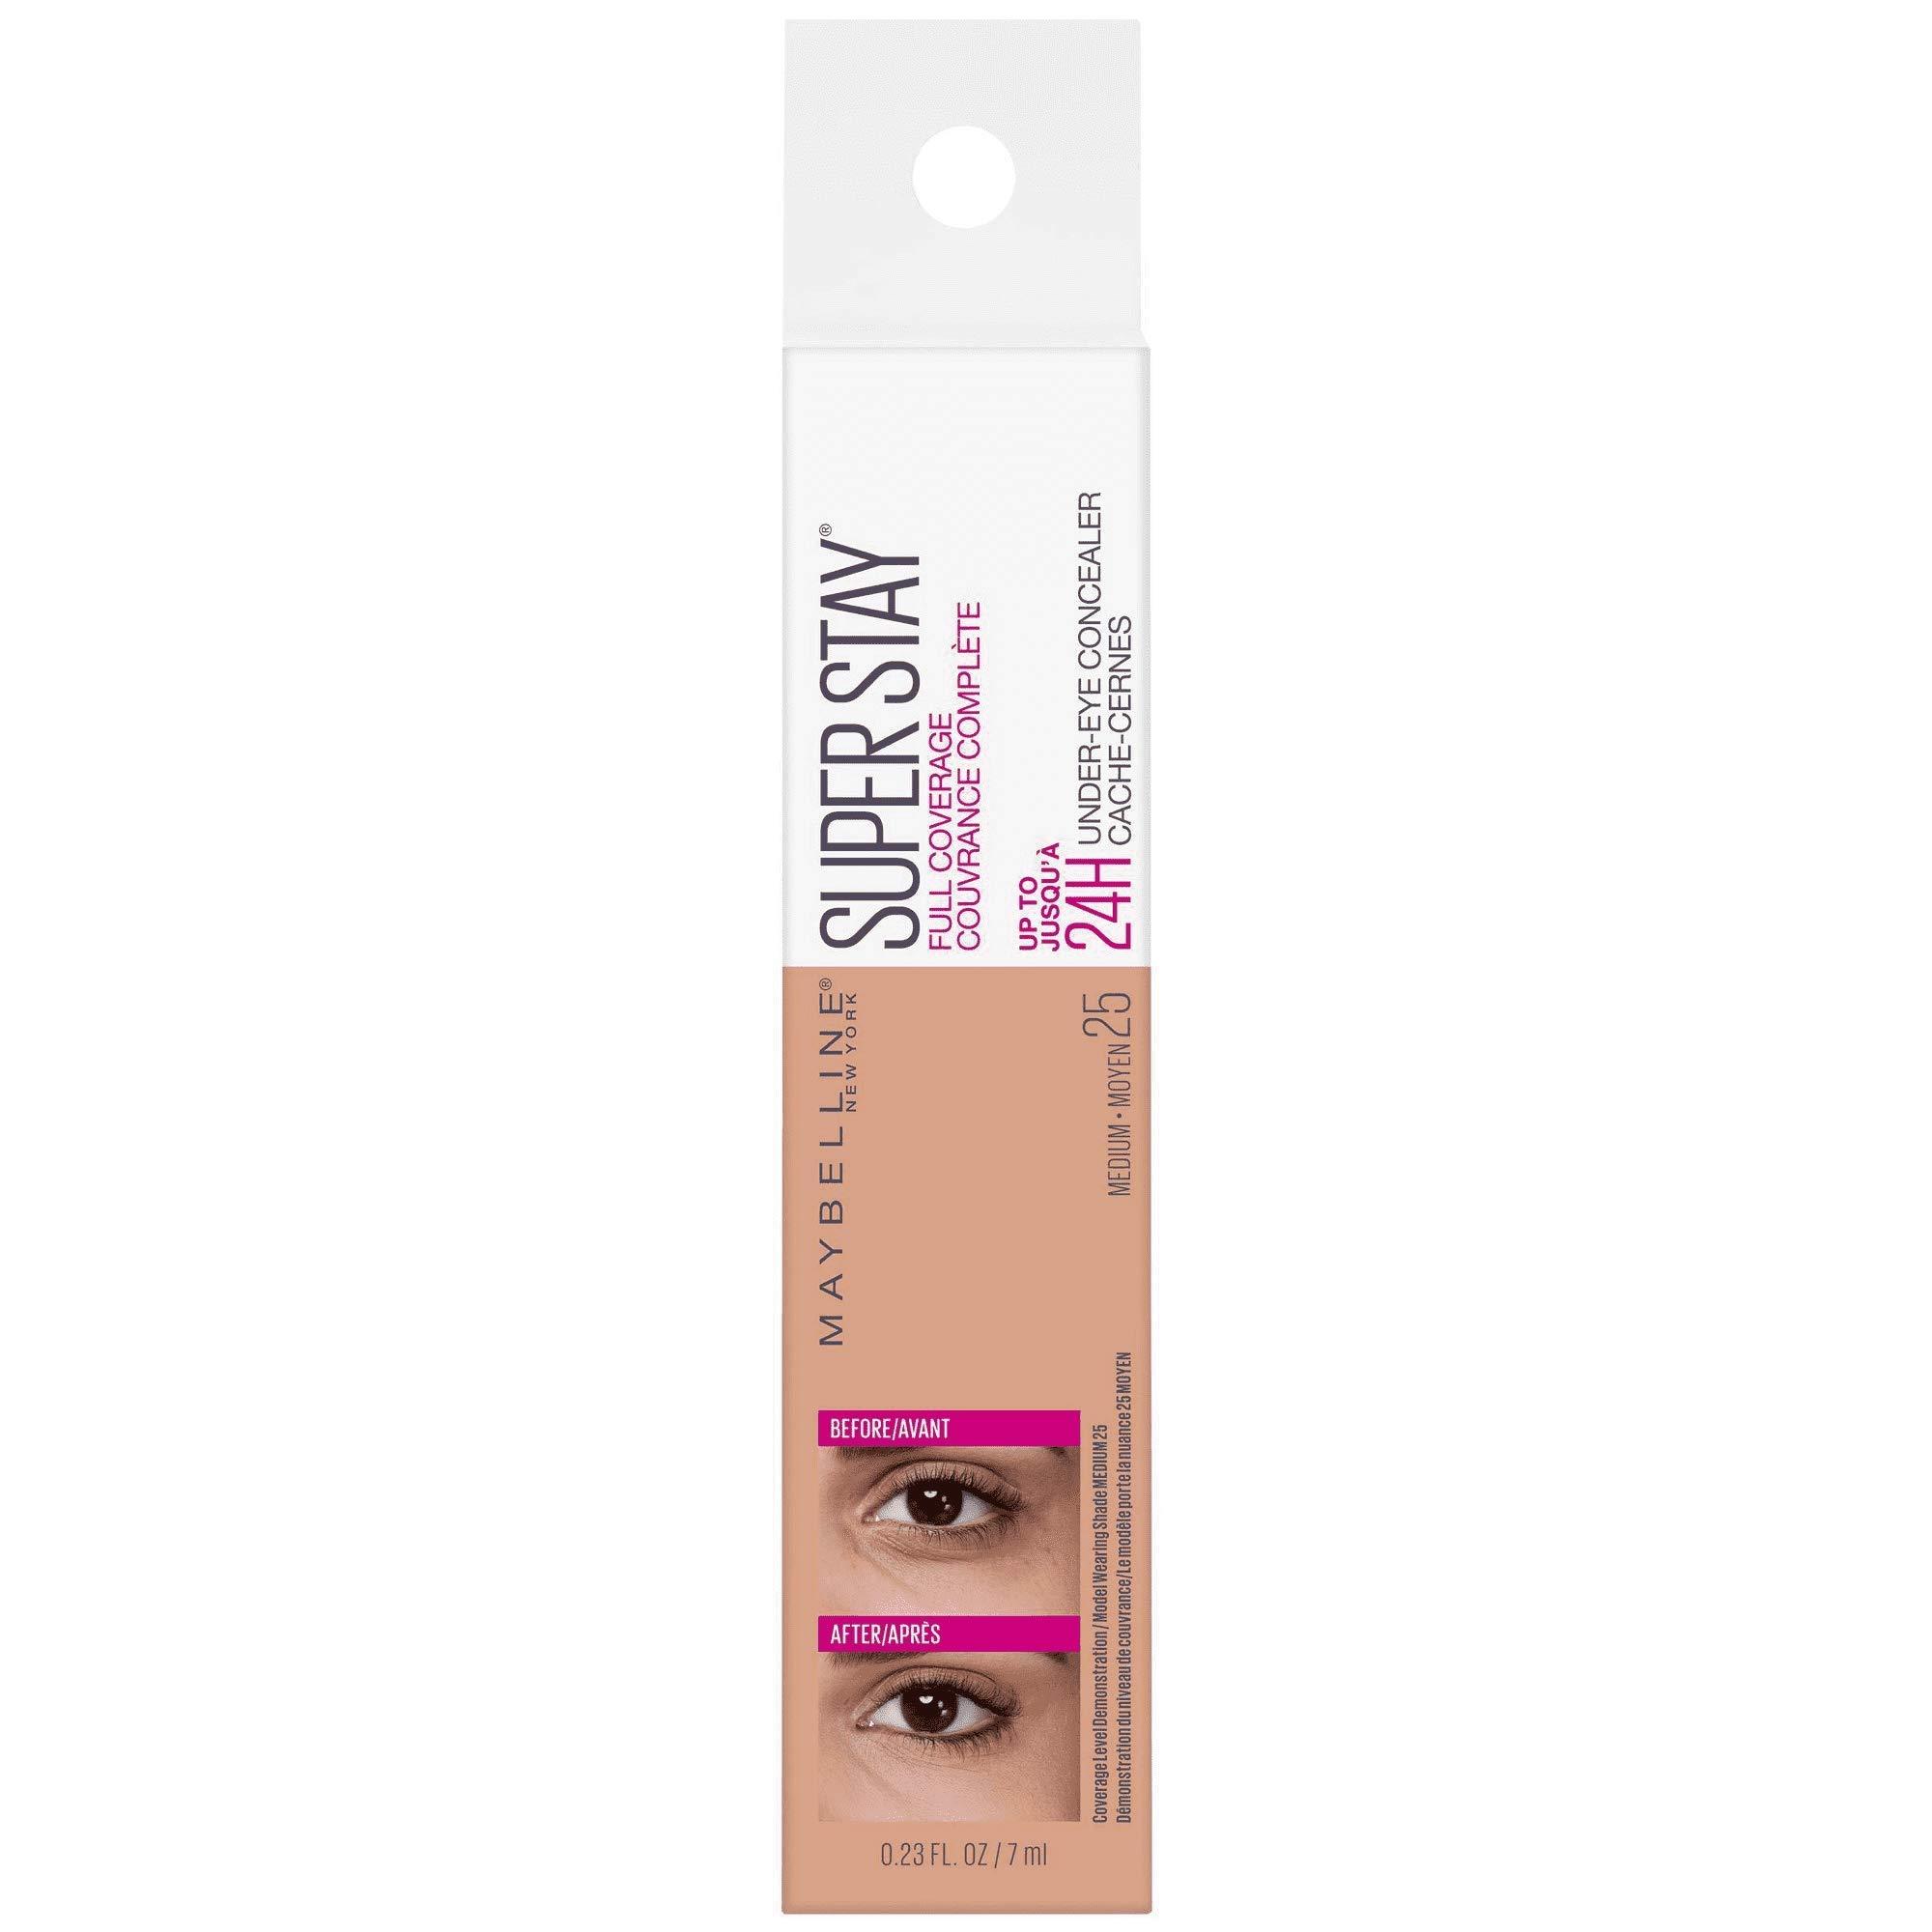 Super Stay Full Coverage Long Lasting Under-Eye Concealer, 25 Medium, 0.23 fl oz (Pack of 2)